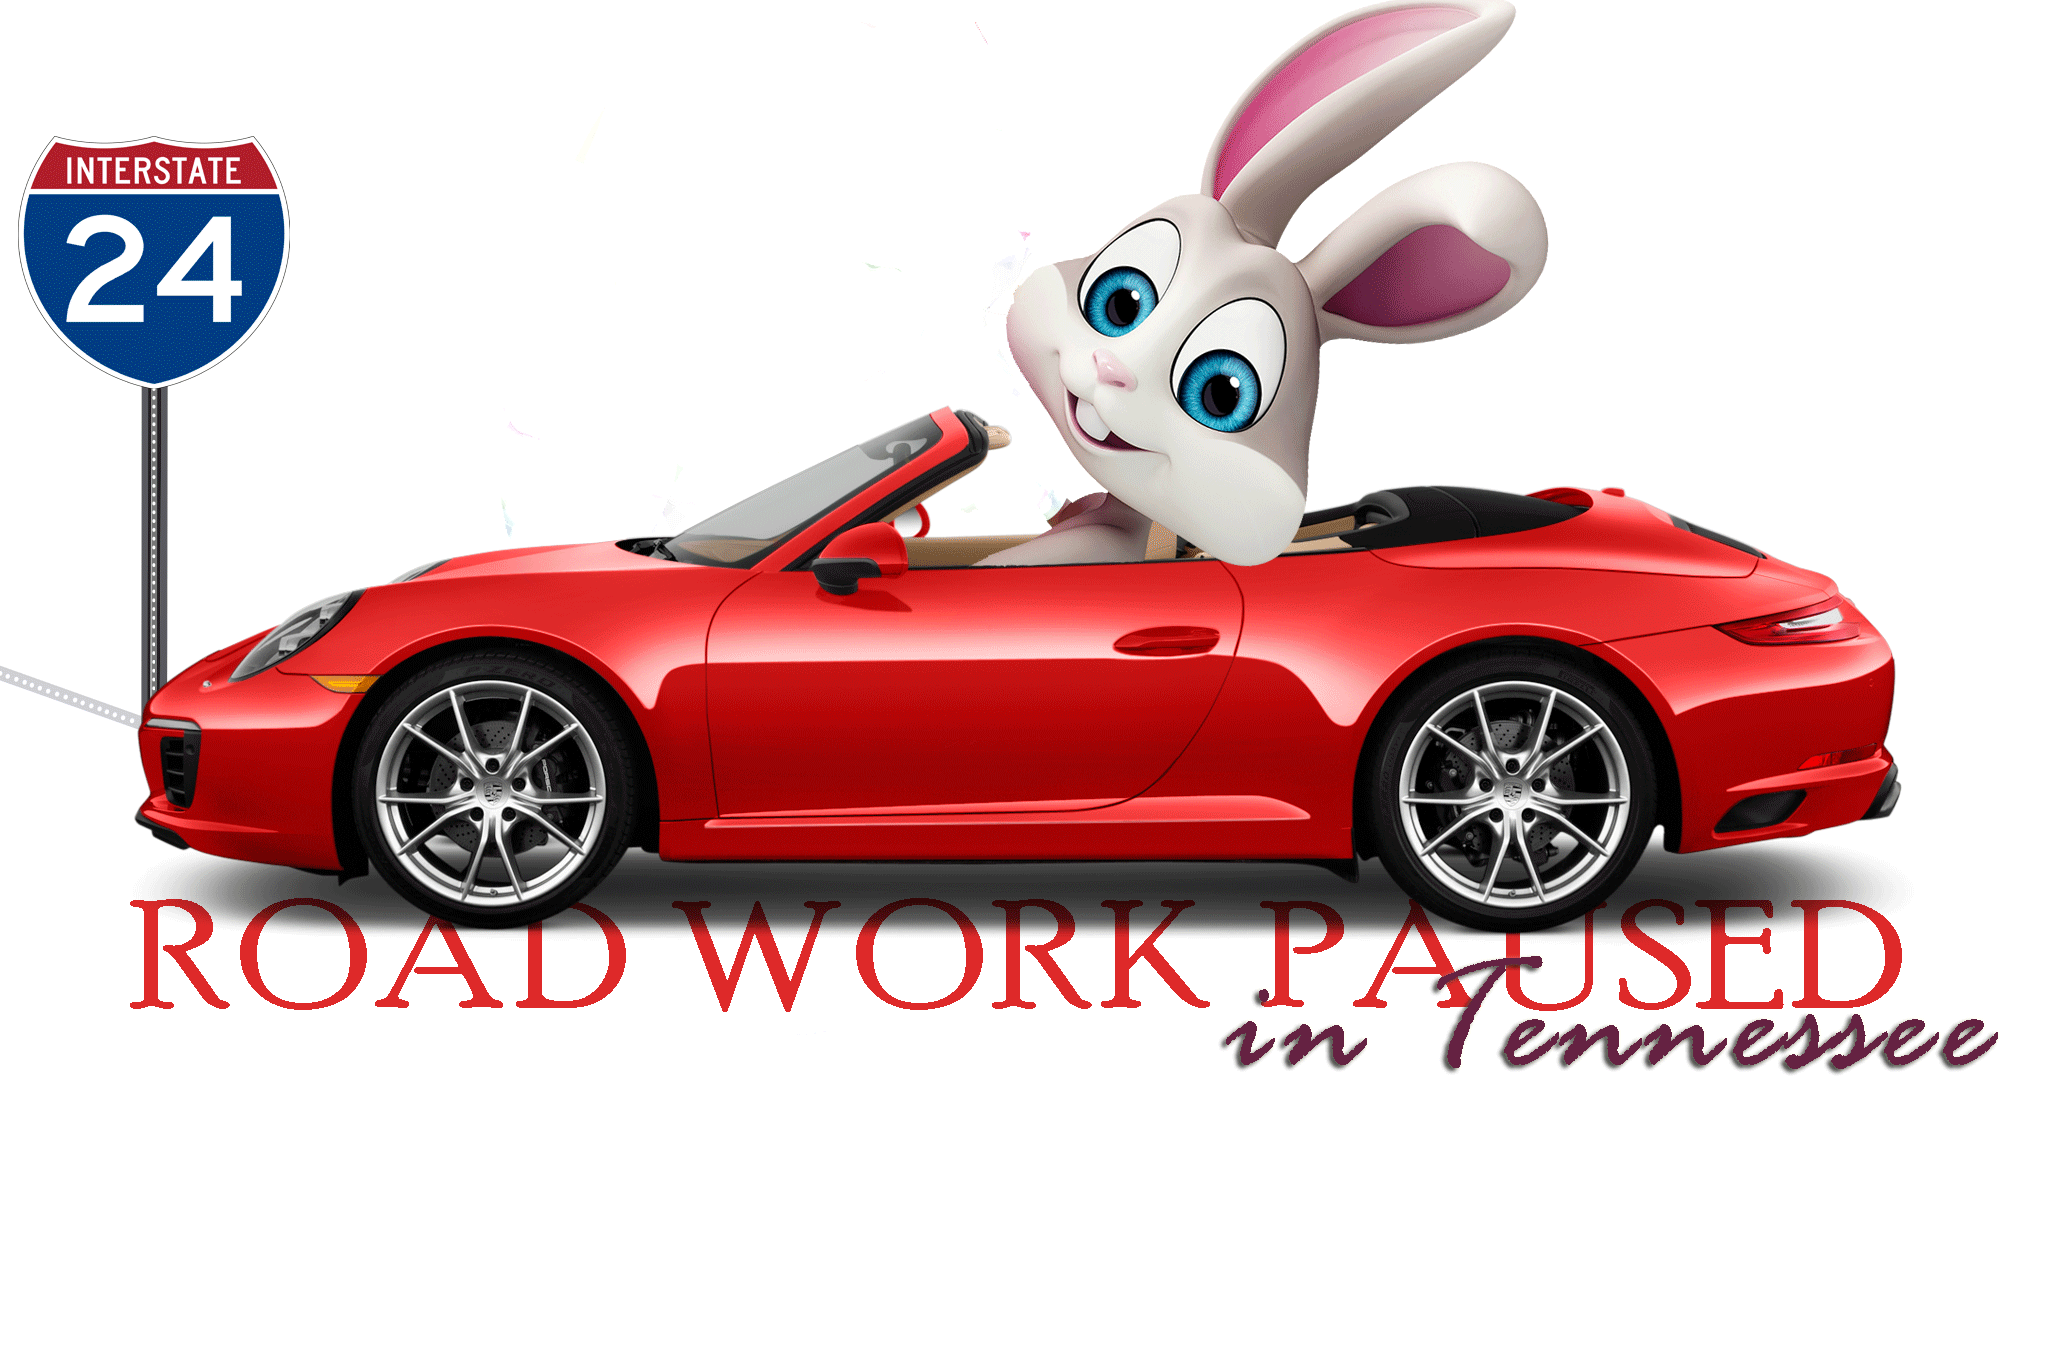 TDOT Suspending Easter Weekend Road Work in Tennessee - Murfreesboro